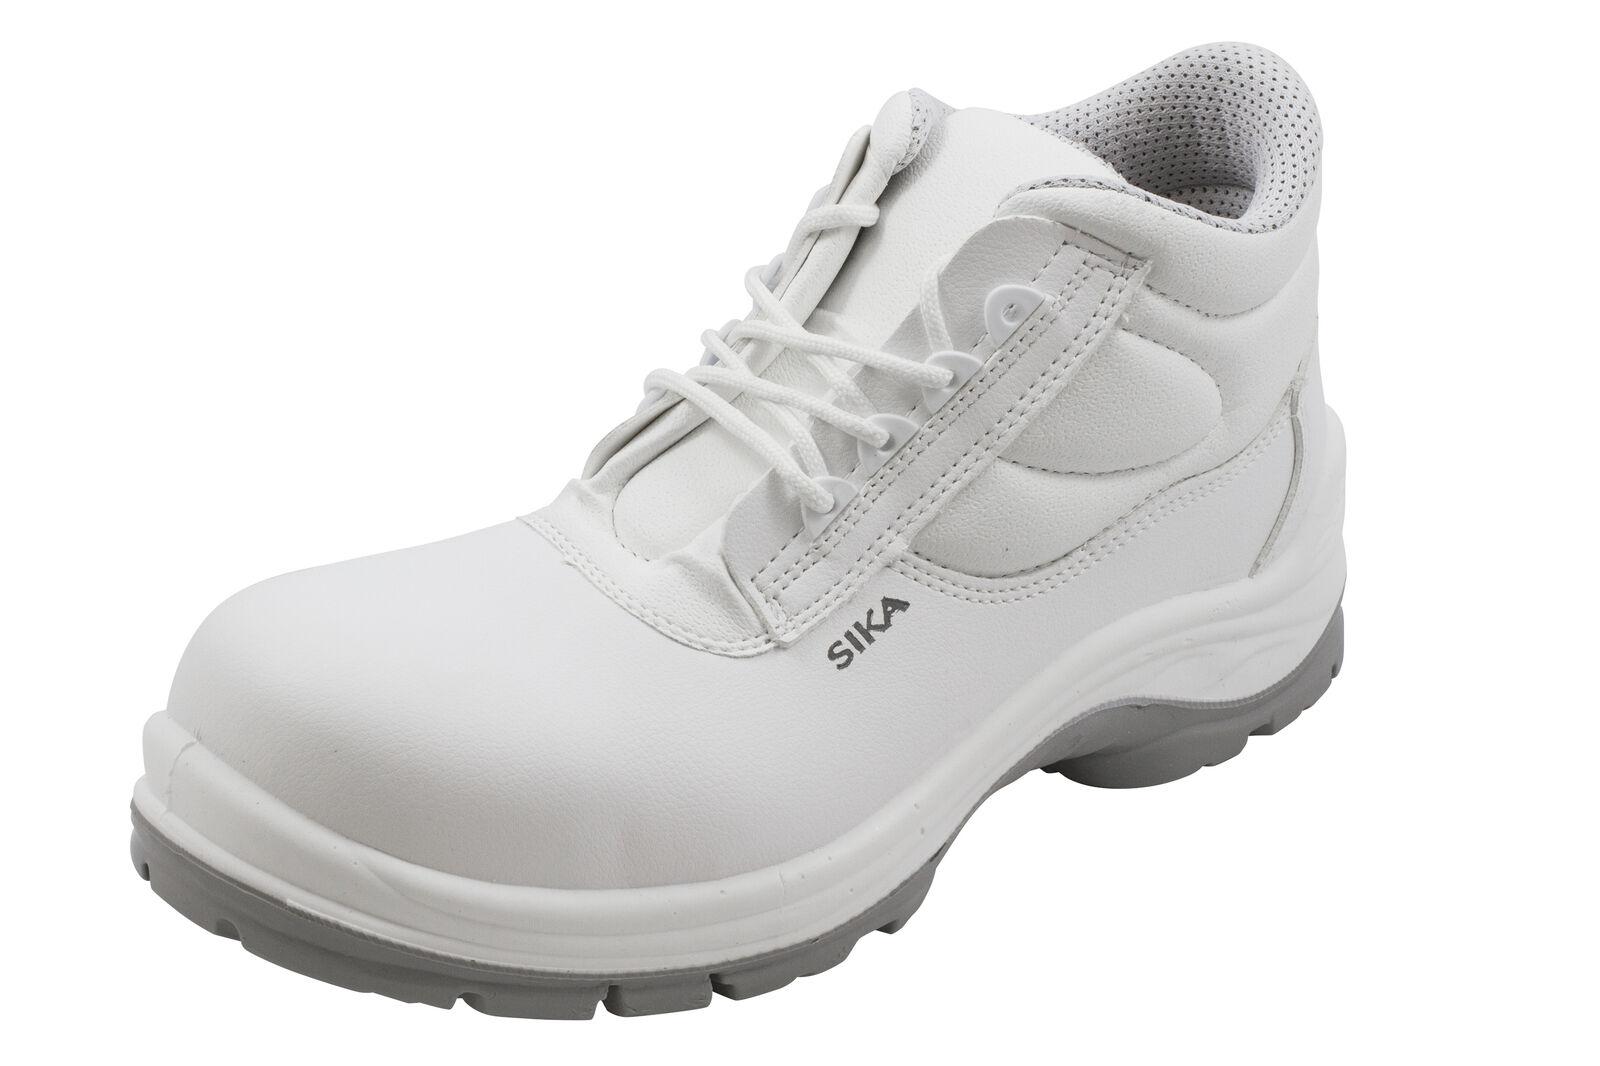 Sika Limber Beat Mid Stiefel di Sicurezza S2 Bianco